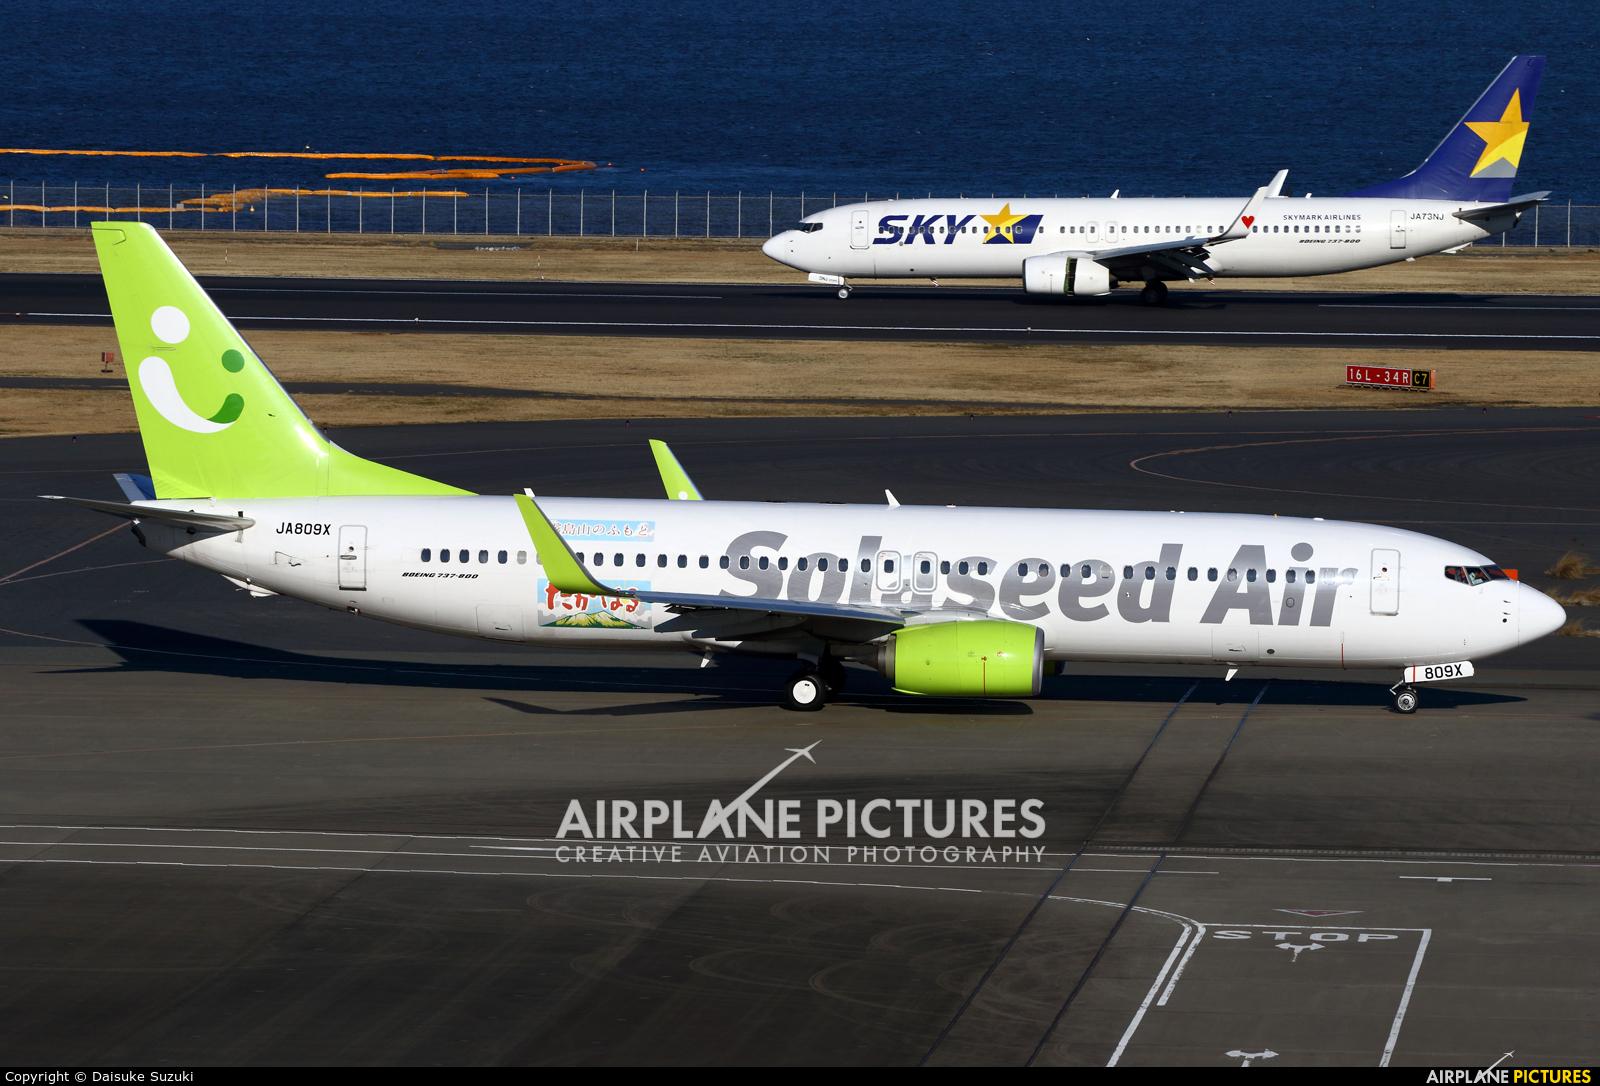 Solaseed Air - Skynet Asia Airways JA809X aircraft at Tokyo - Haneda Intl